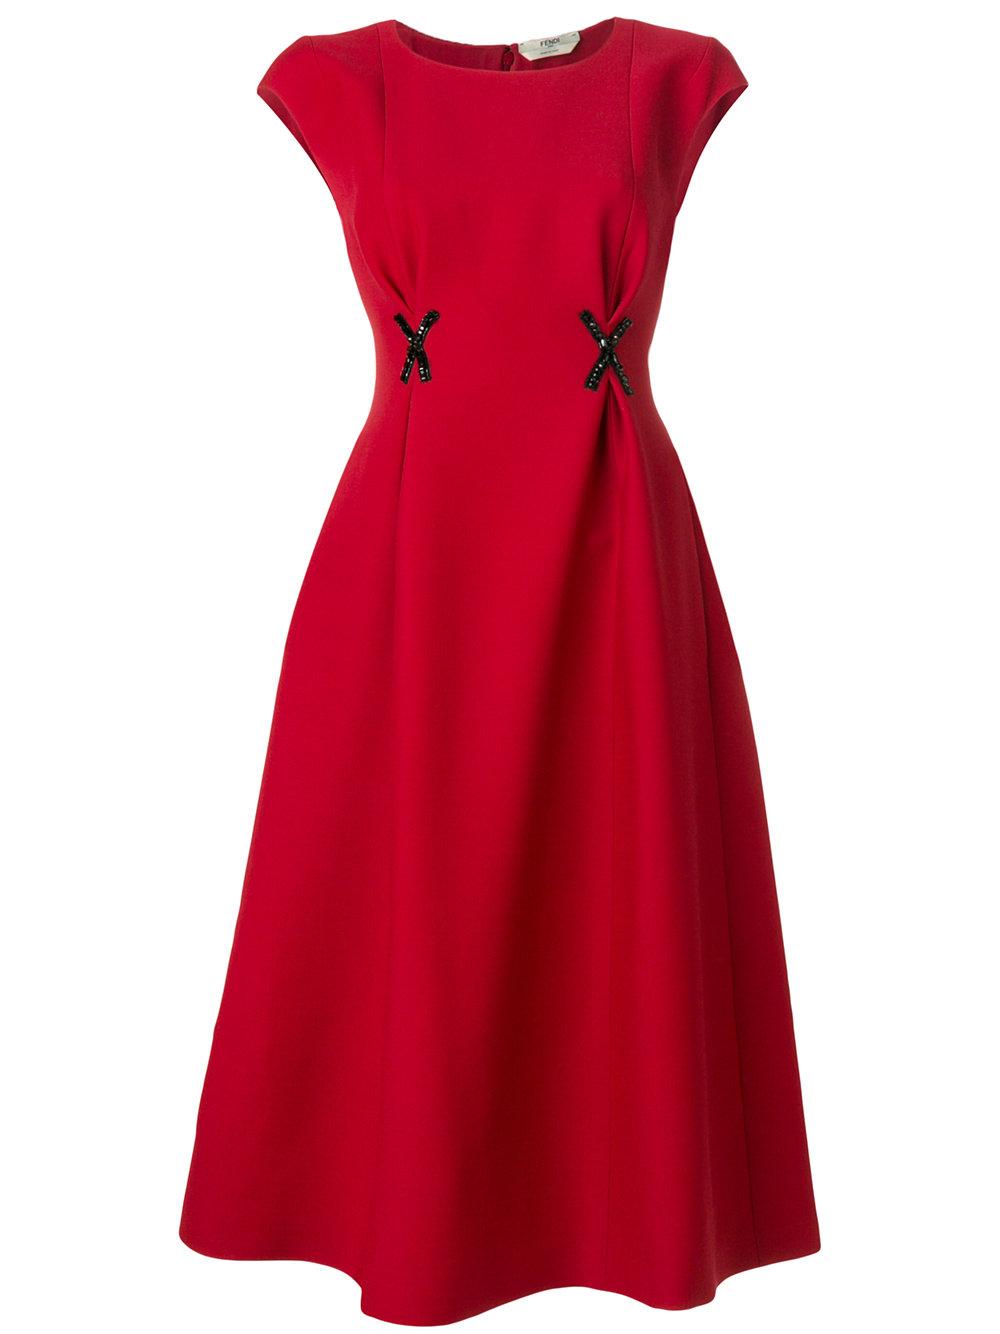 FENDI appliqué dress - $2,850